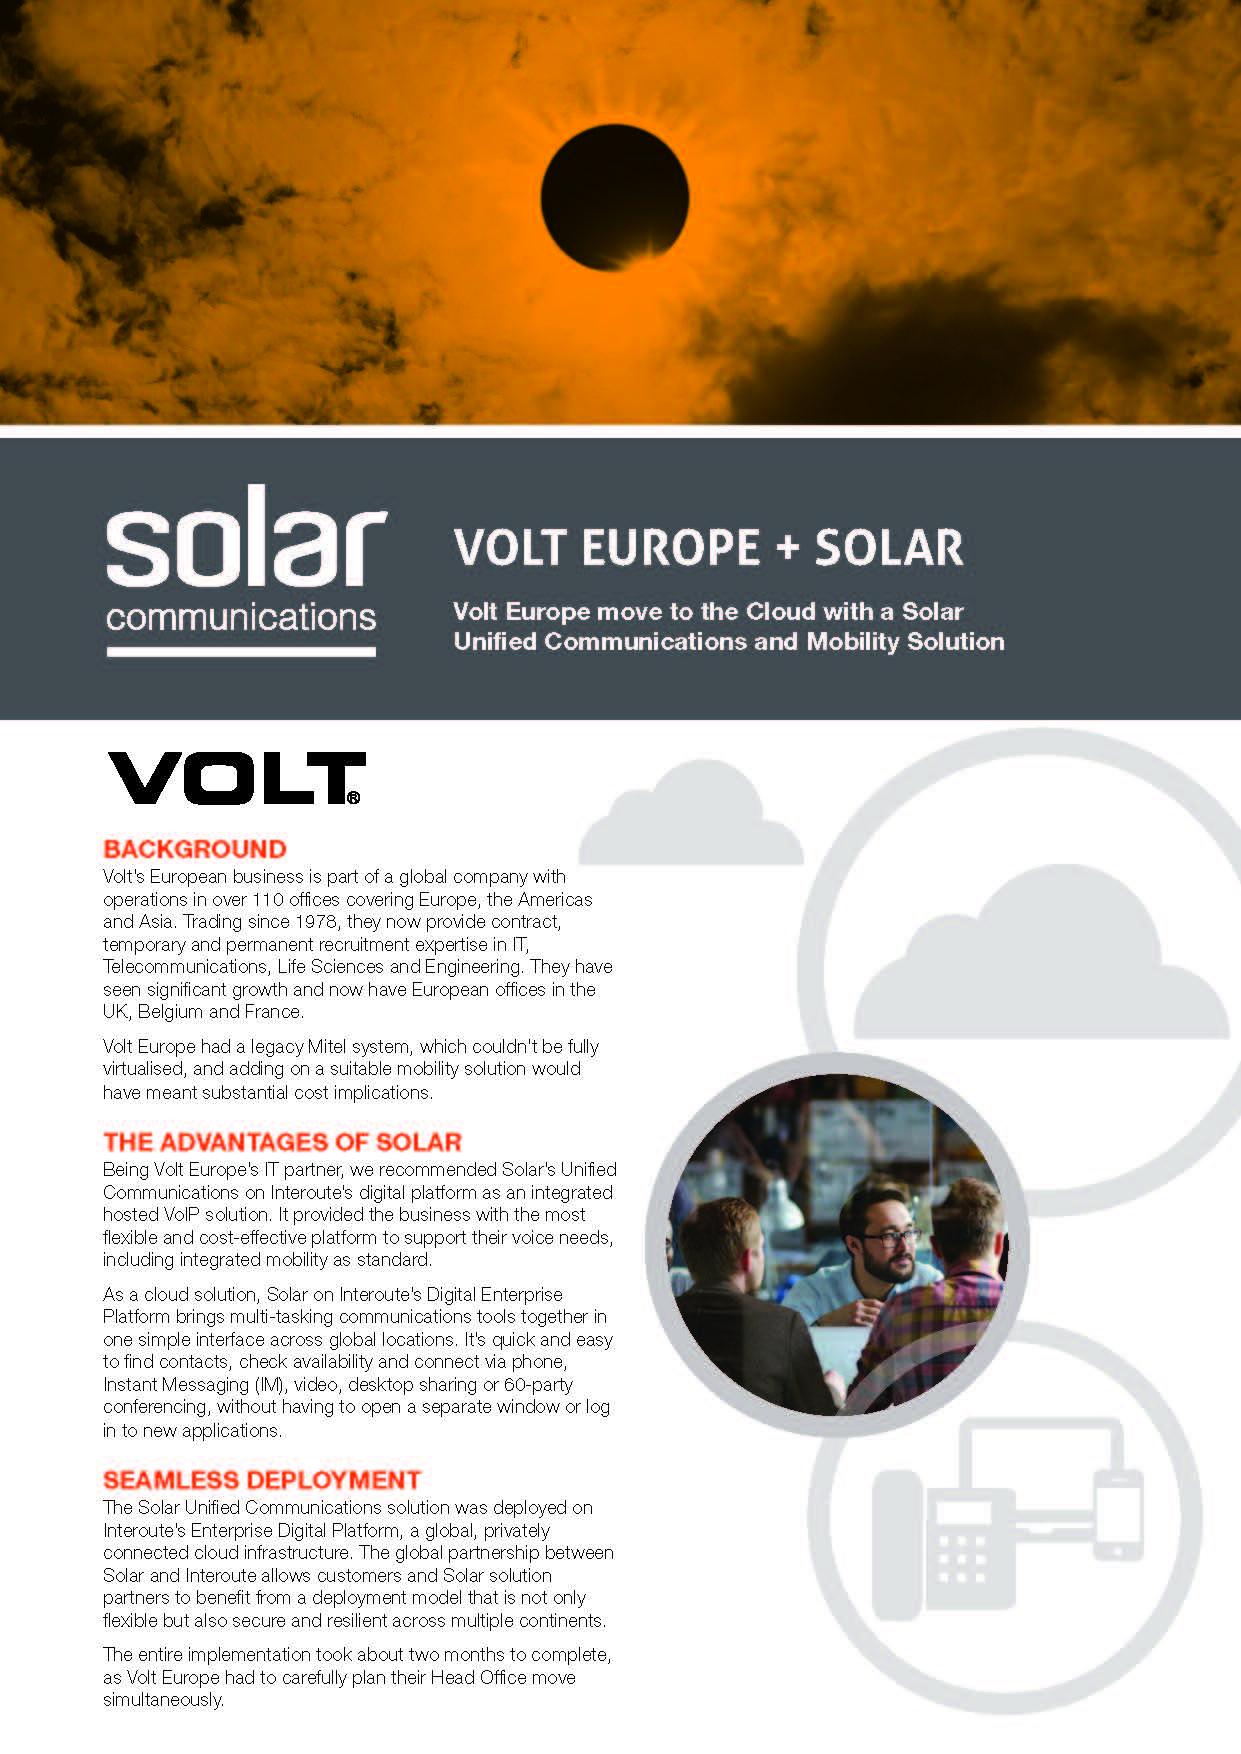 Solar Volt Europe + Solar_Page_1.jpg